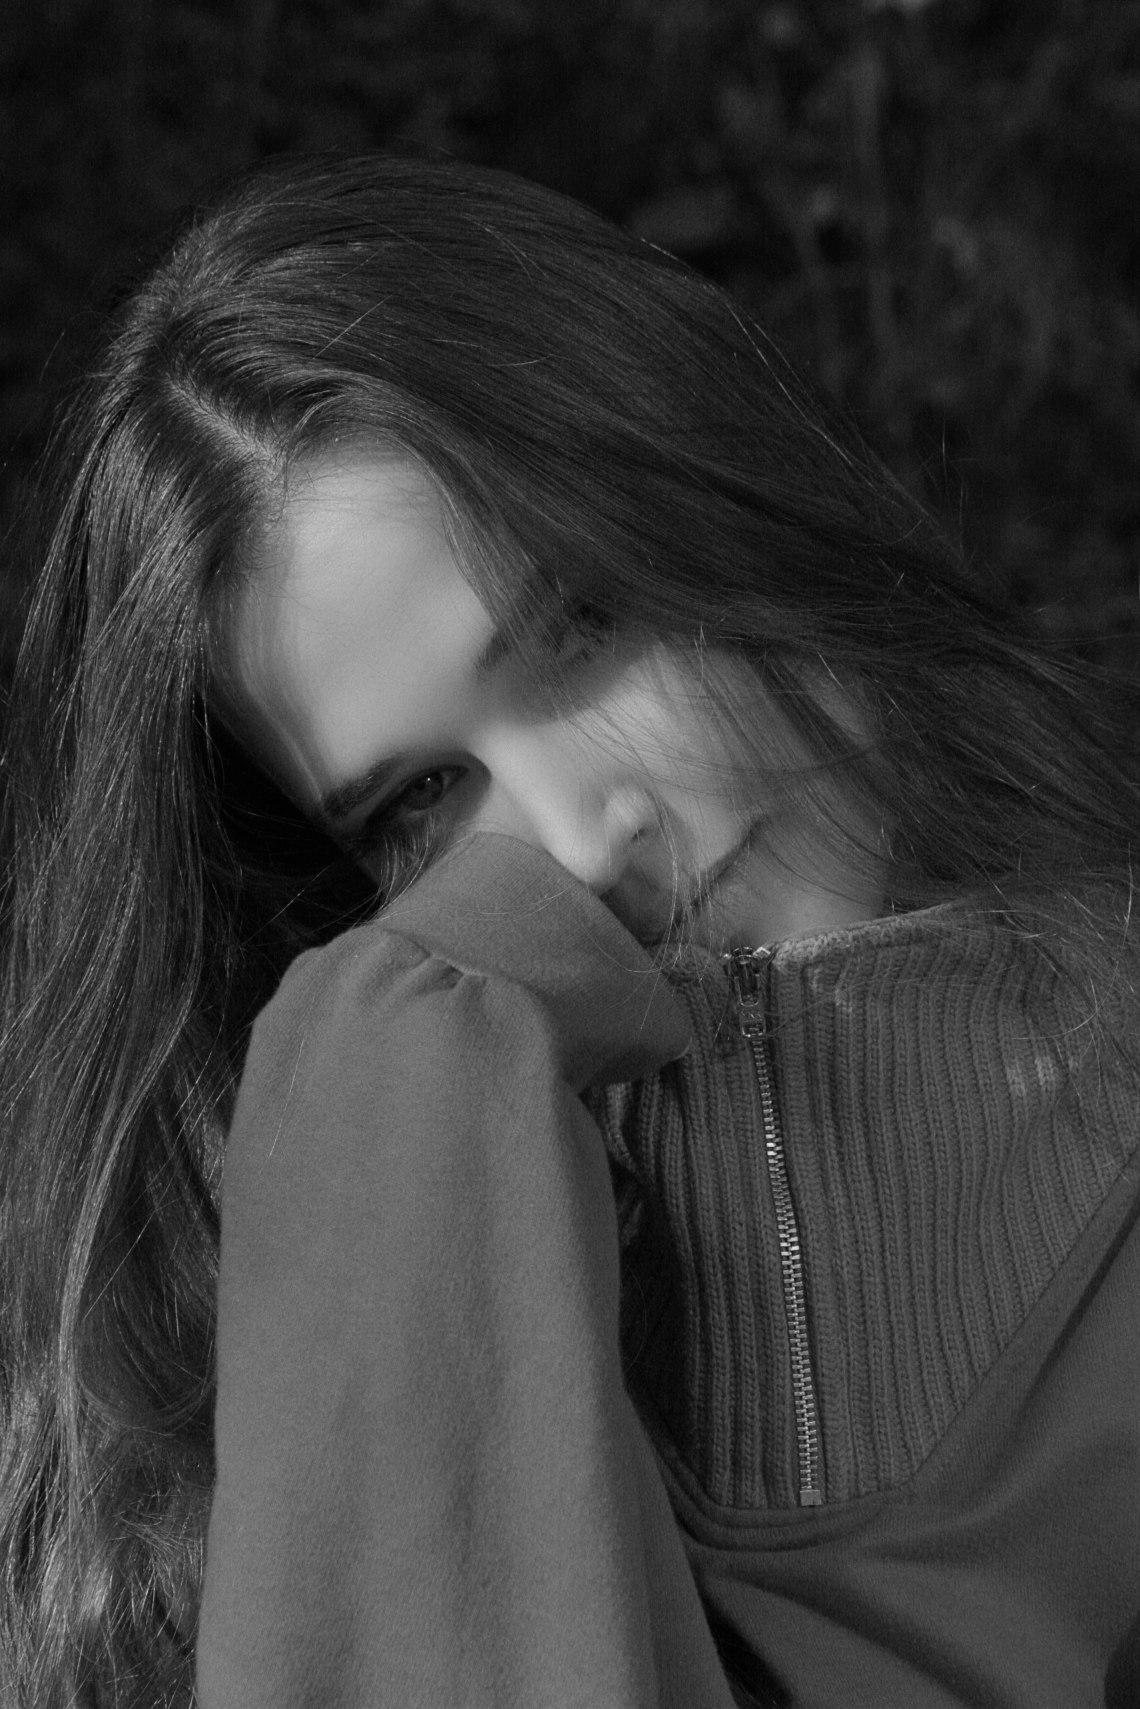 elena huskova model